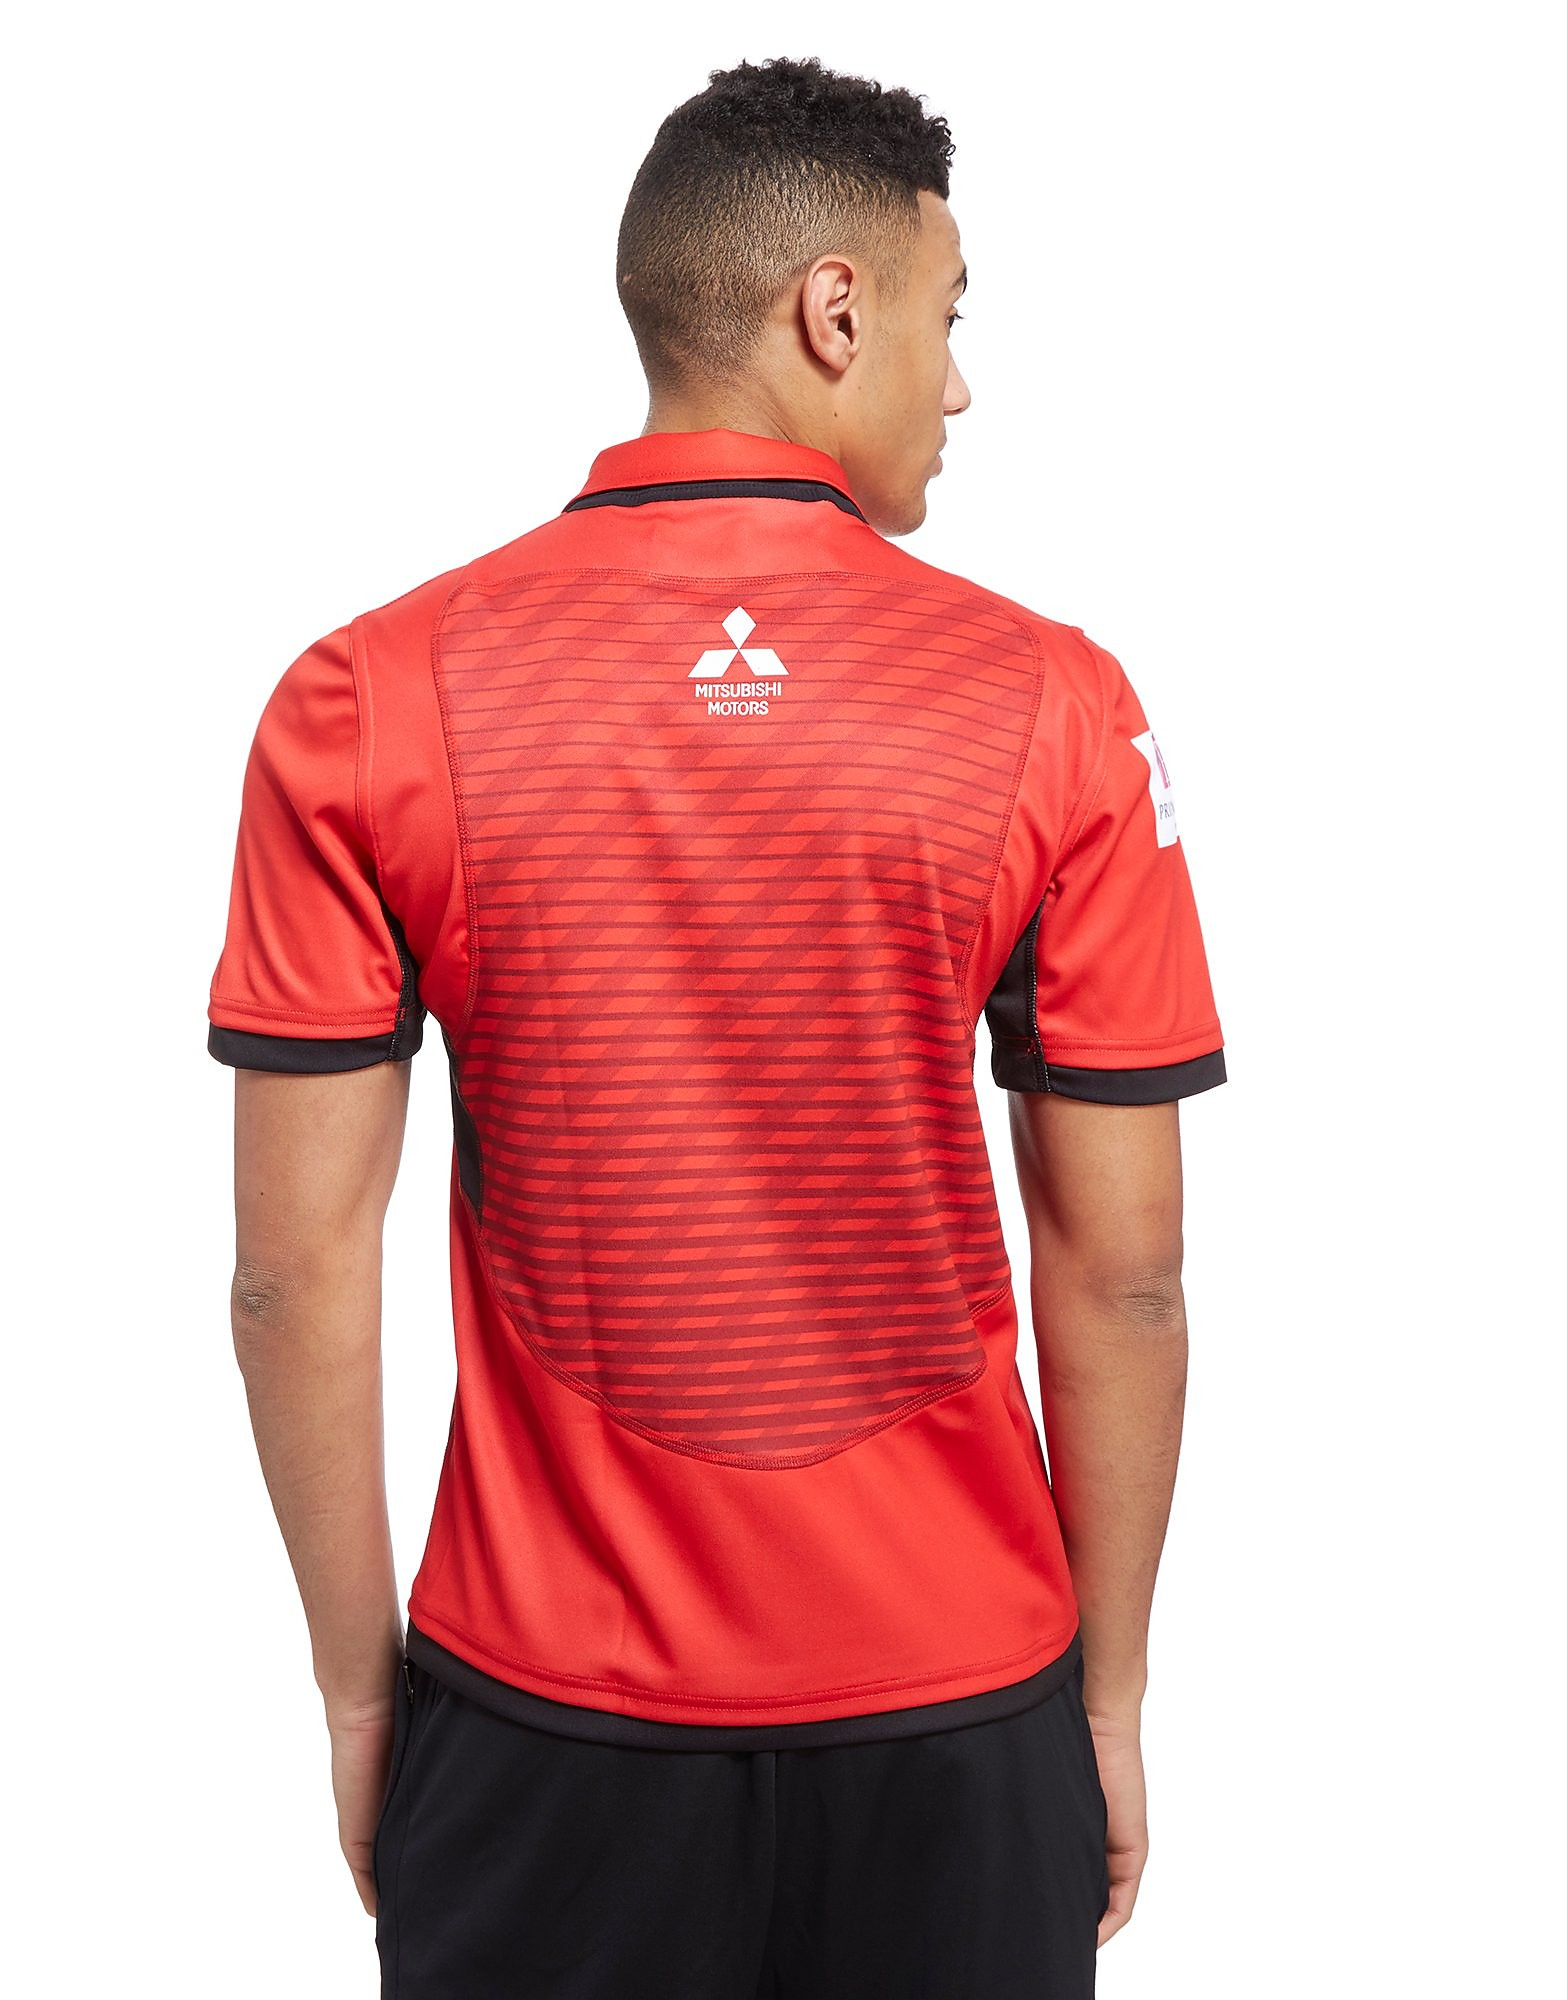 Macron Edinburgh Rugby 2017/18 Away Shirt